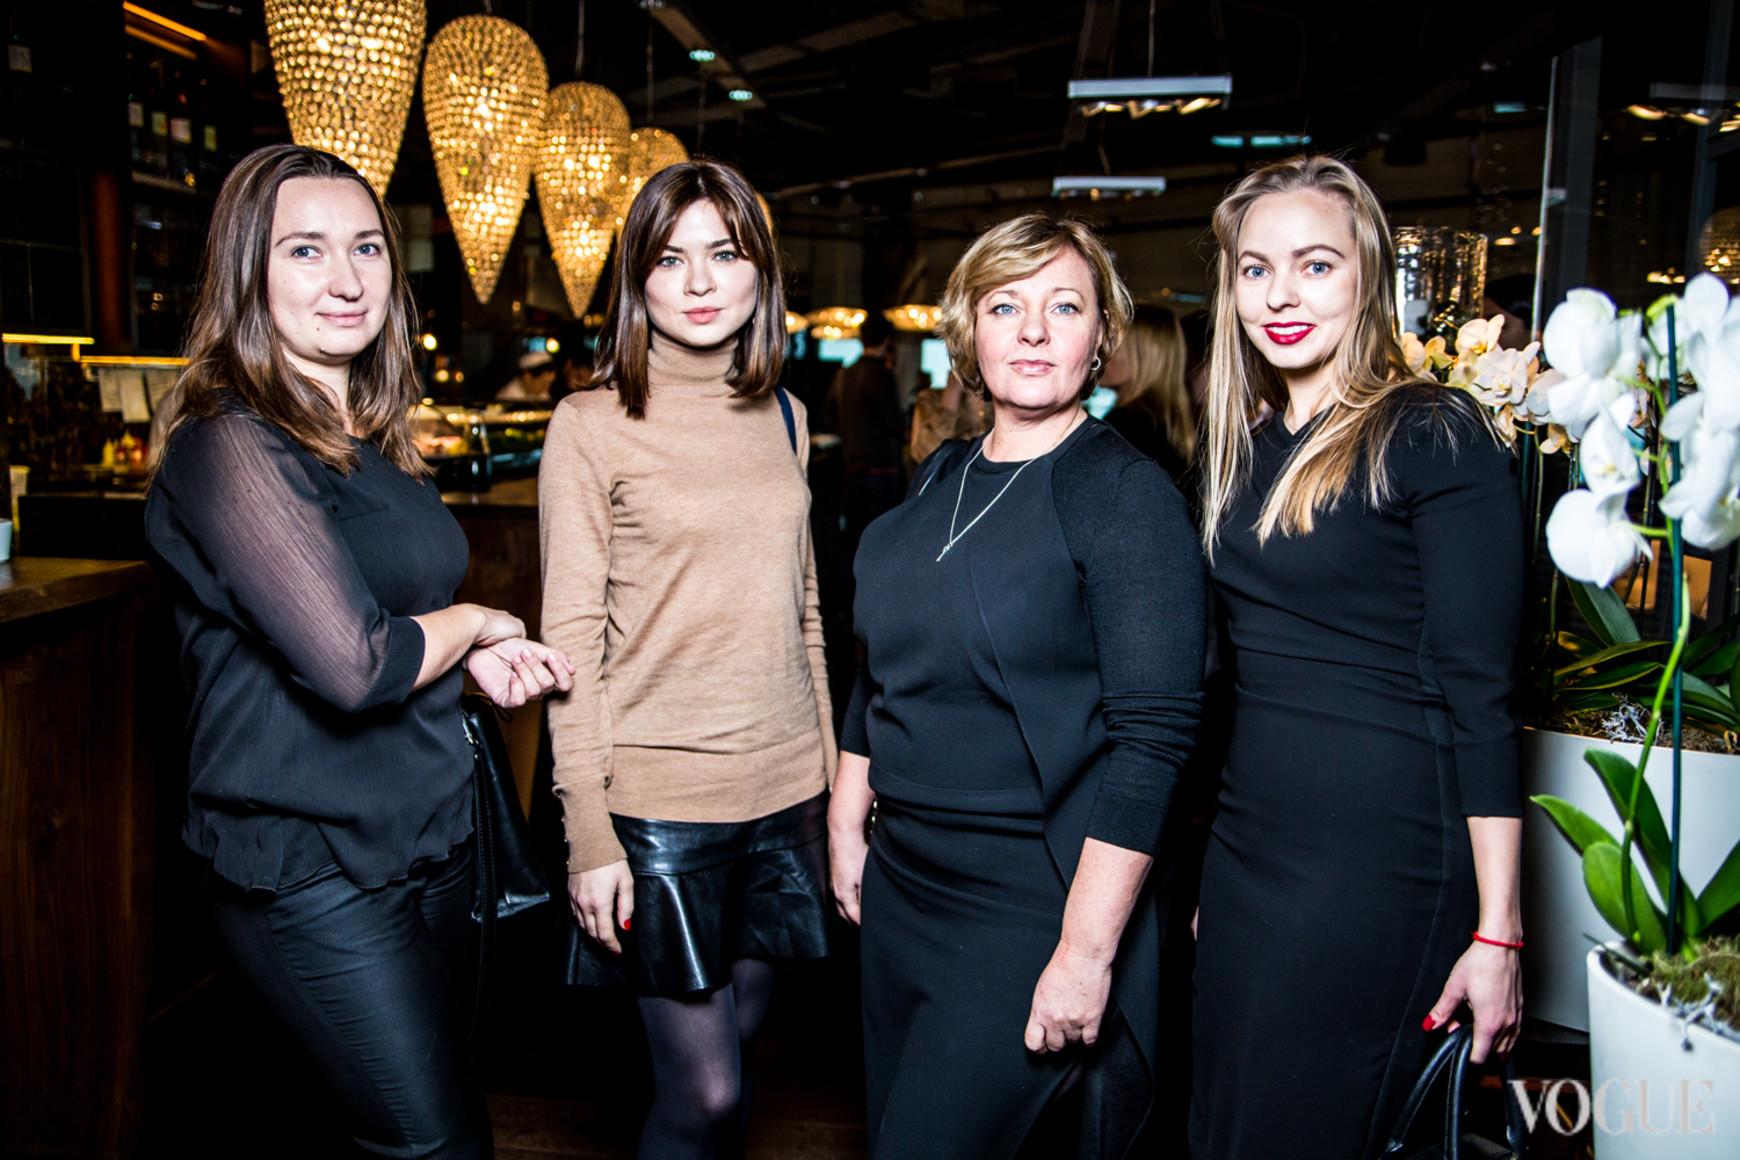 Тамара Лелеко, Катерина Демина, Ирина Малашенко, Наталья Лавринович